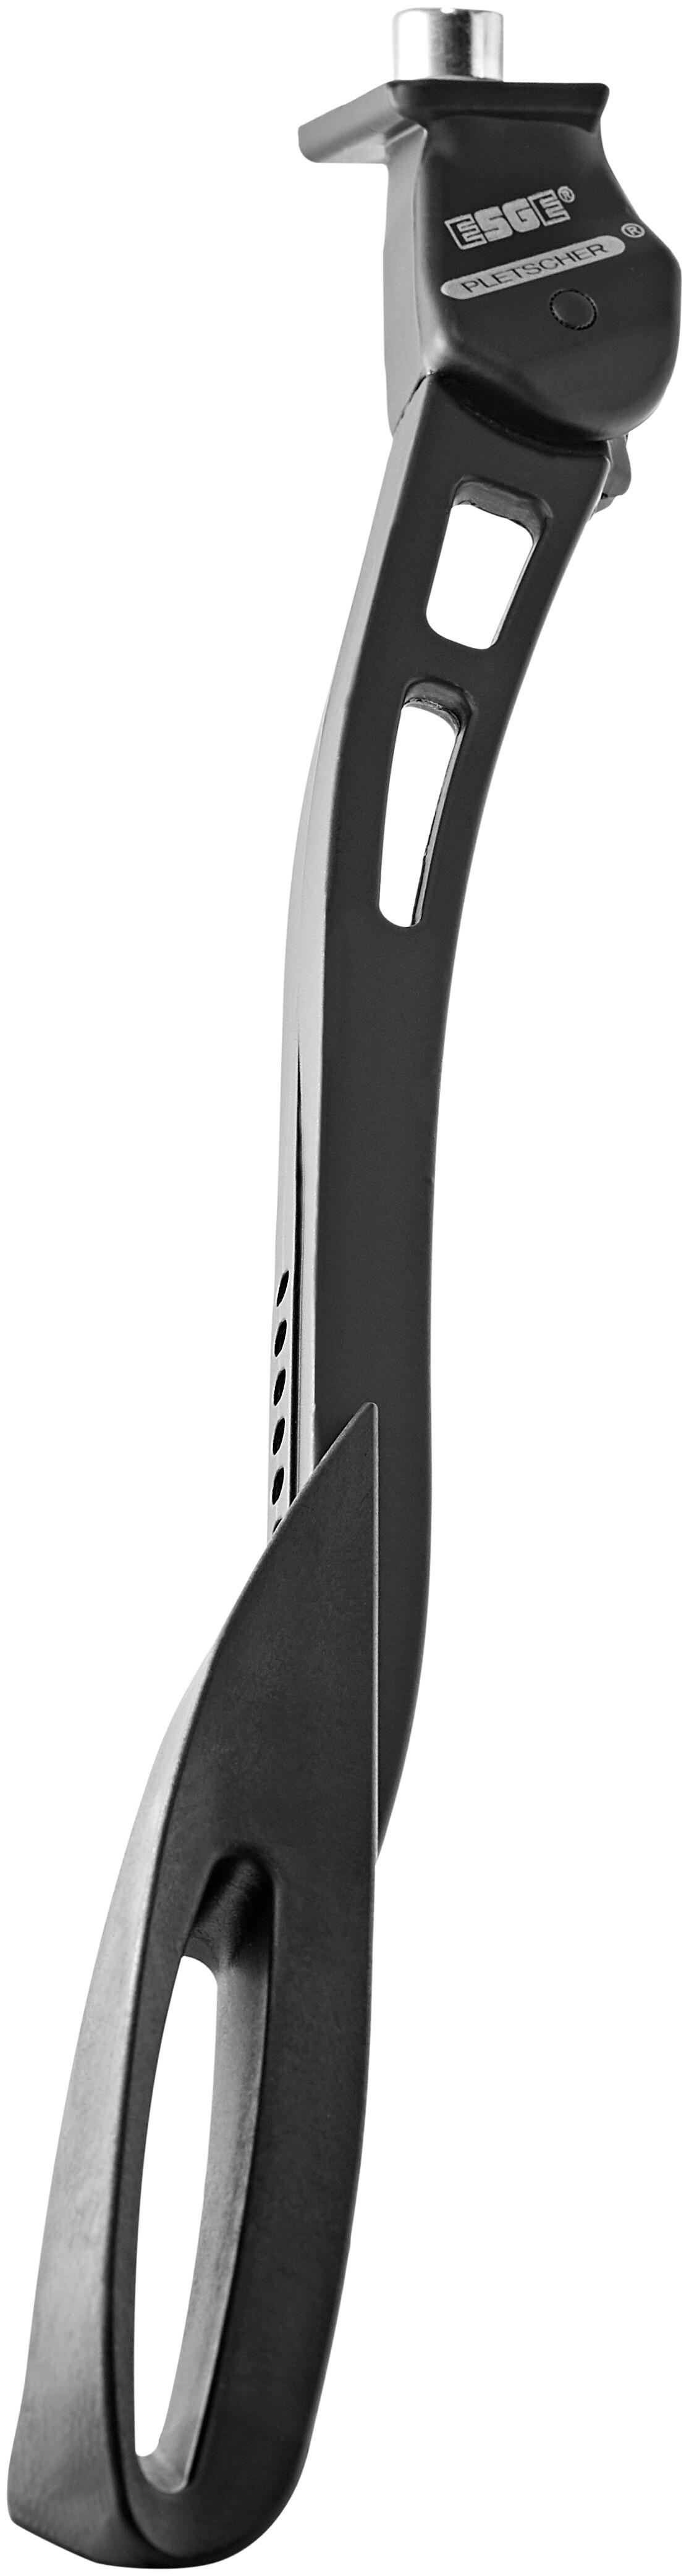 Pletscher Esge Comp Zoom Hinterbauständer 26-28 Zoll 2018 Fahrradständer